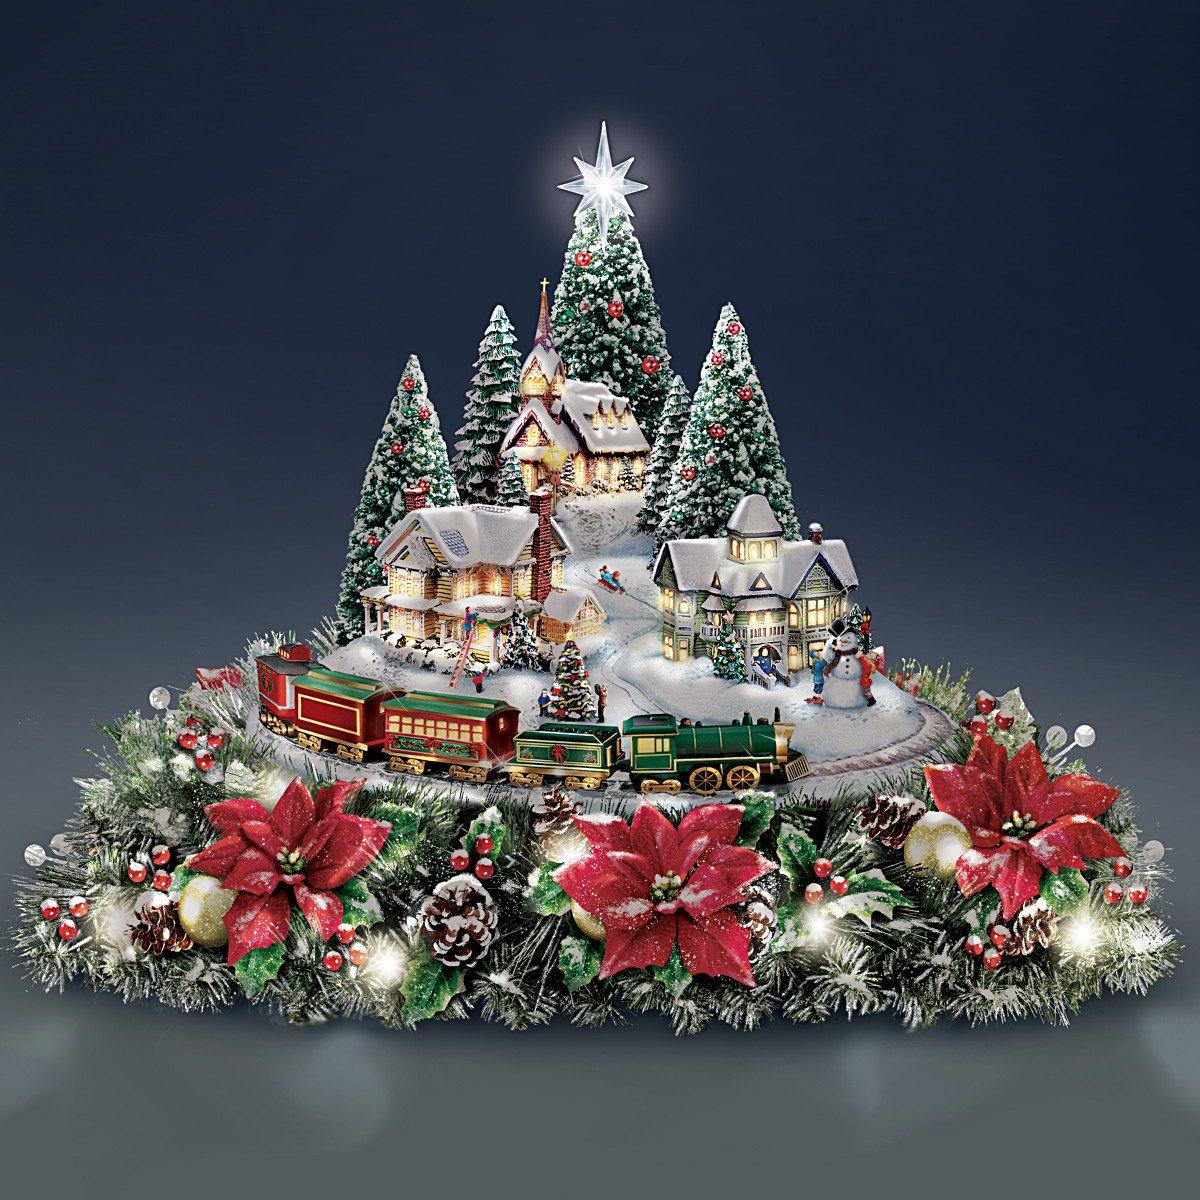 Thomas Kinkade Christmas Village – Merry Christmas And Happy New ...